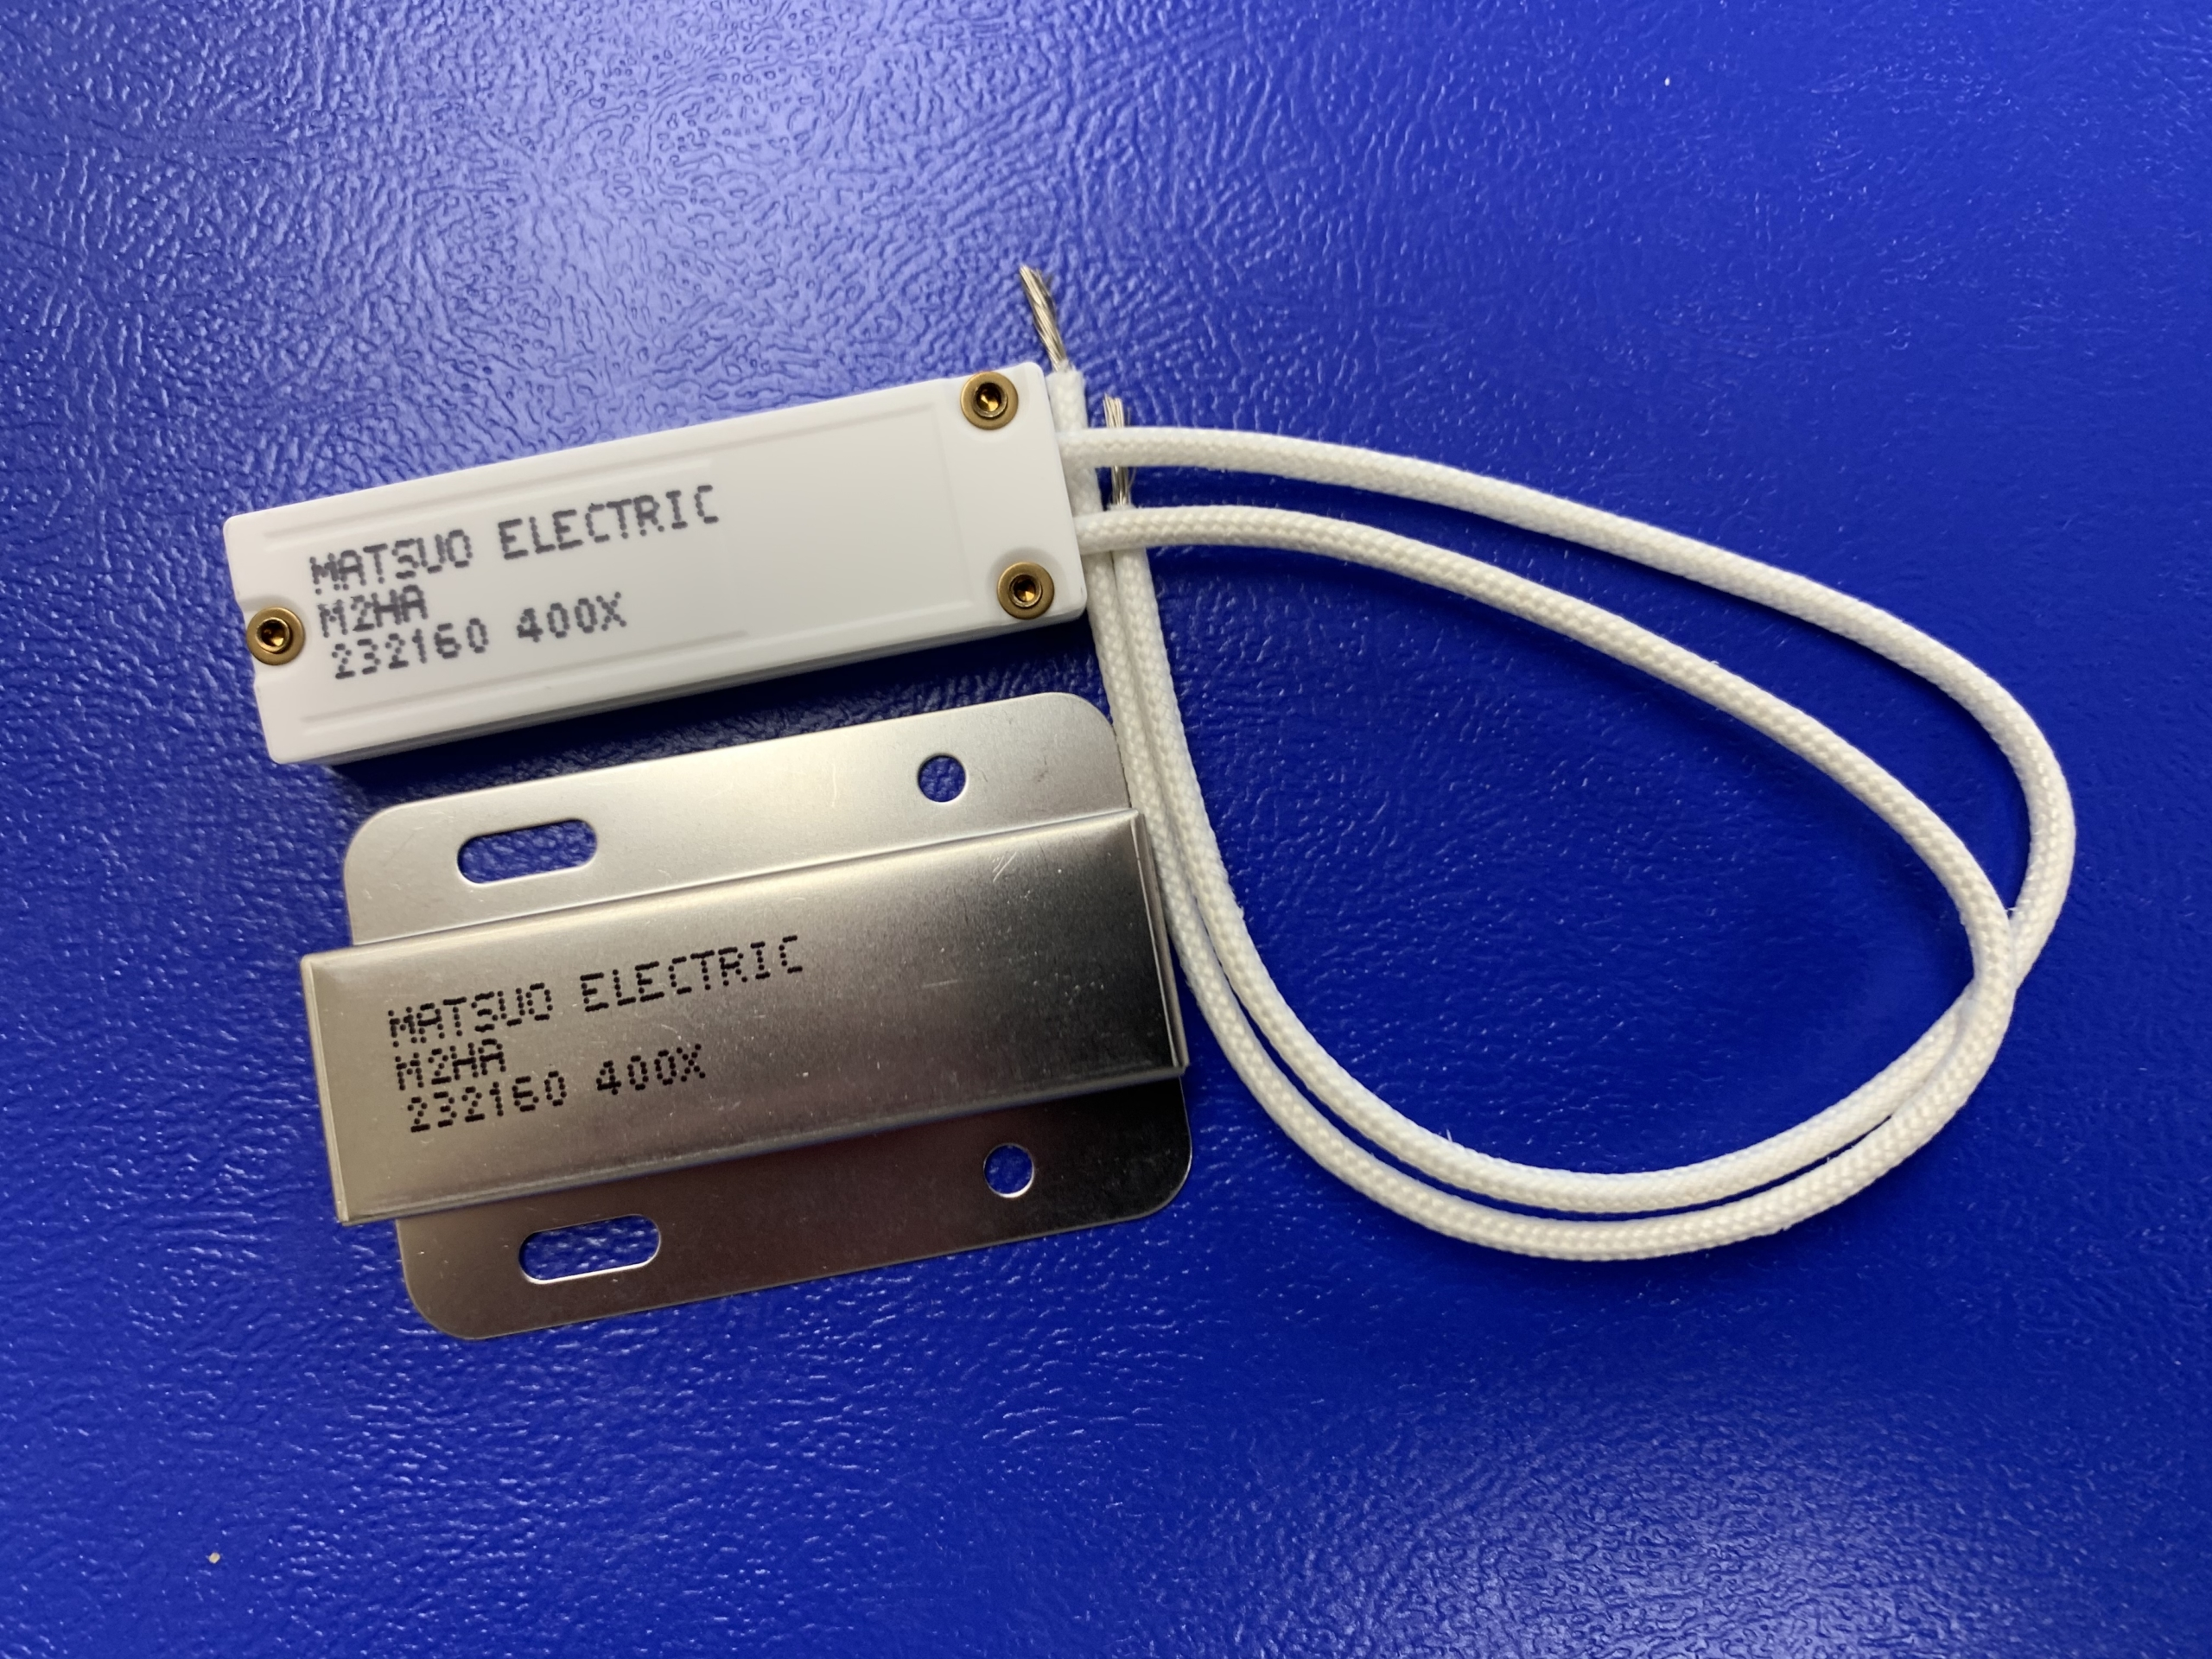 Matsuo Electric